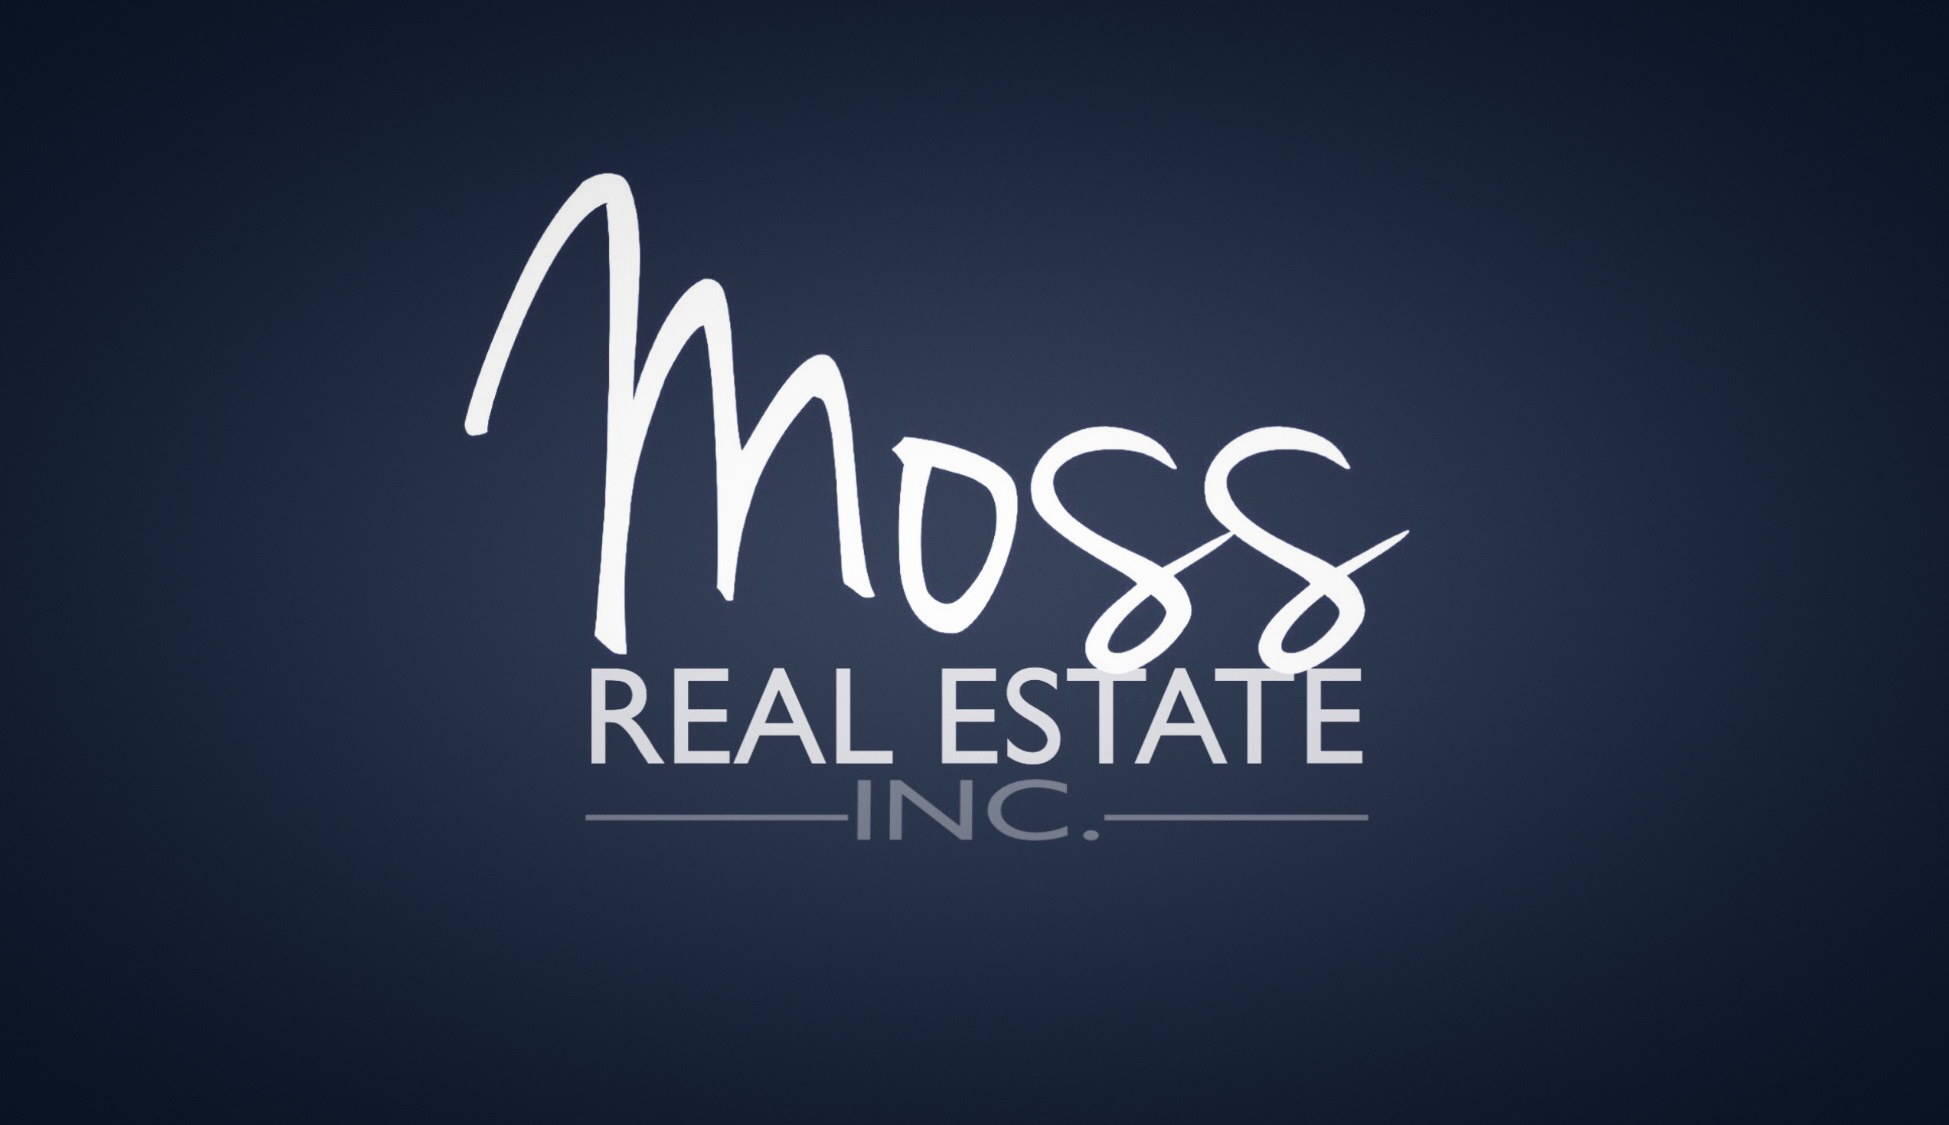 Moss Real Estate, Inc.